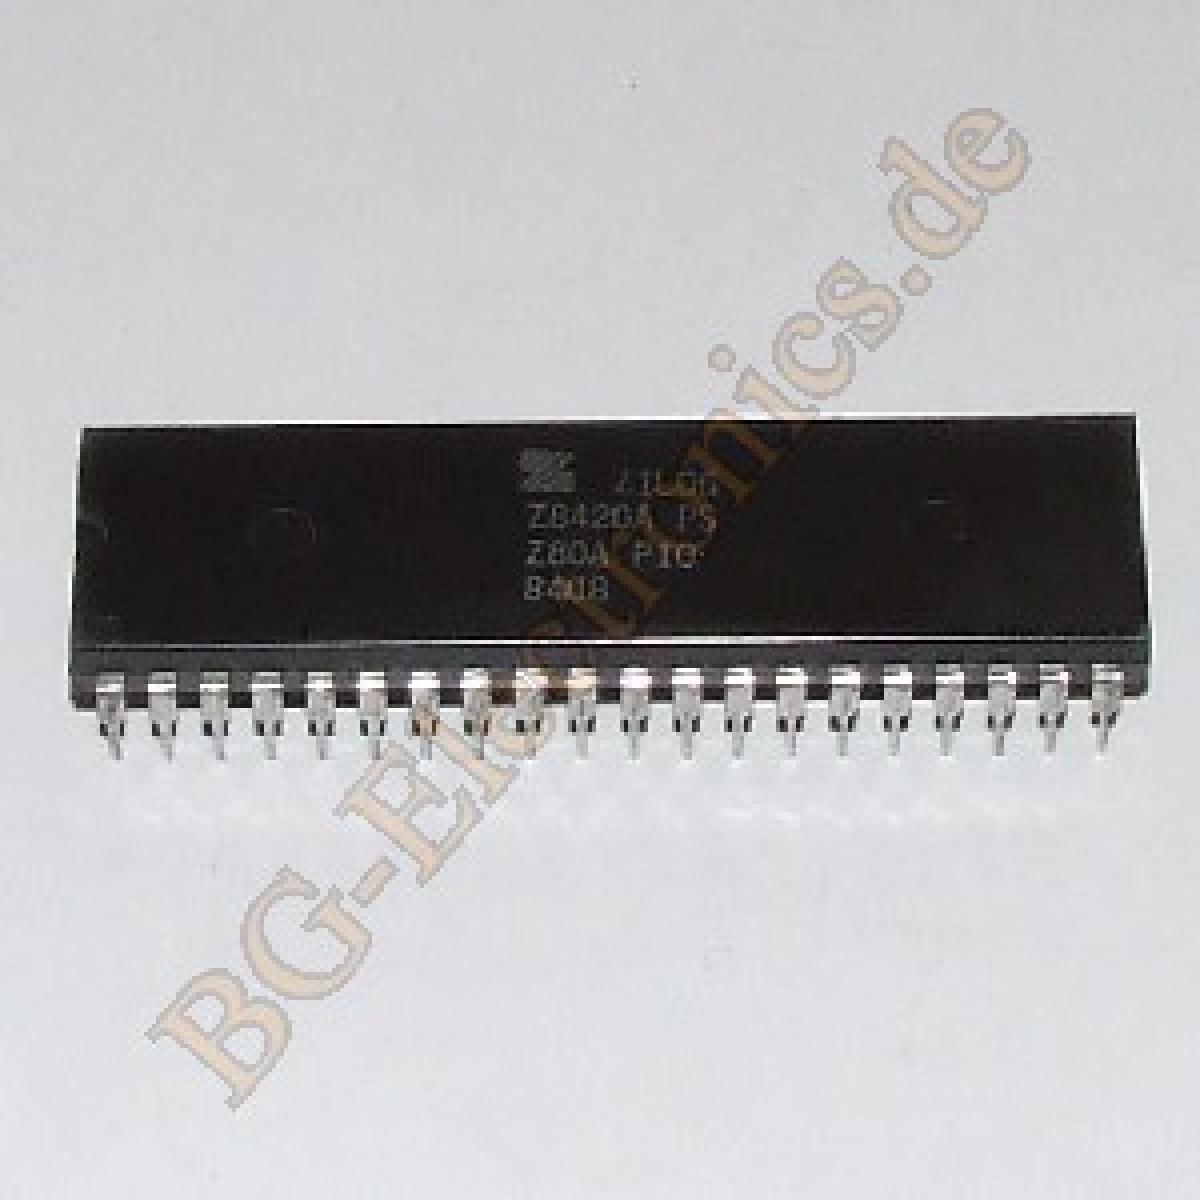 1-x-Z8420A-NMOS-CMOS-Z80-PIO-PARALLEL-INPUT-OUTPUT-Z8420APS-Zilog-DIP-40-1pcs